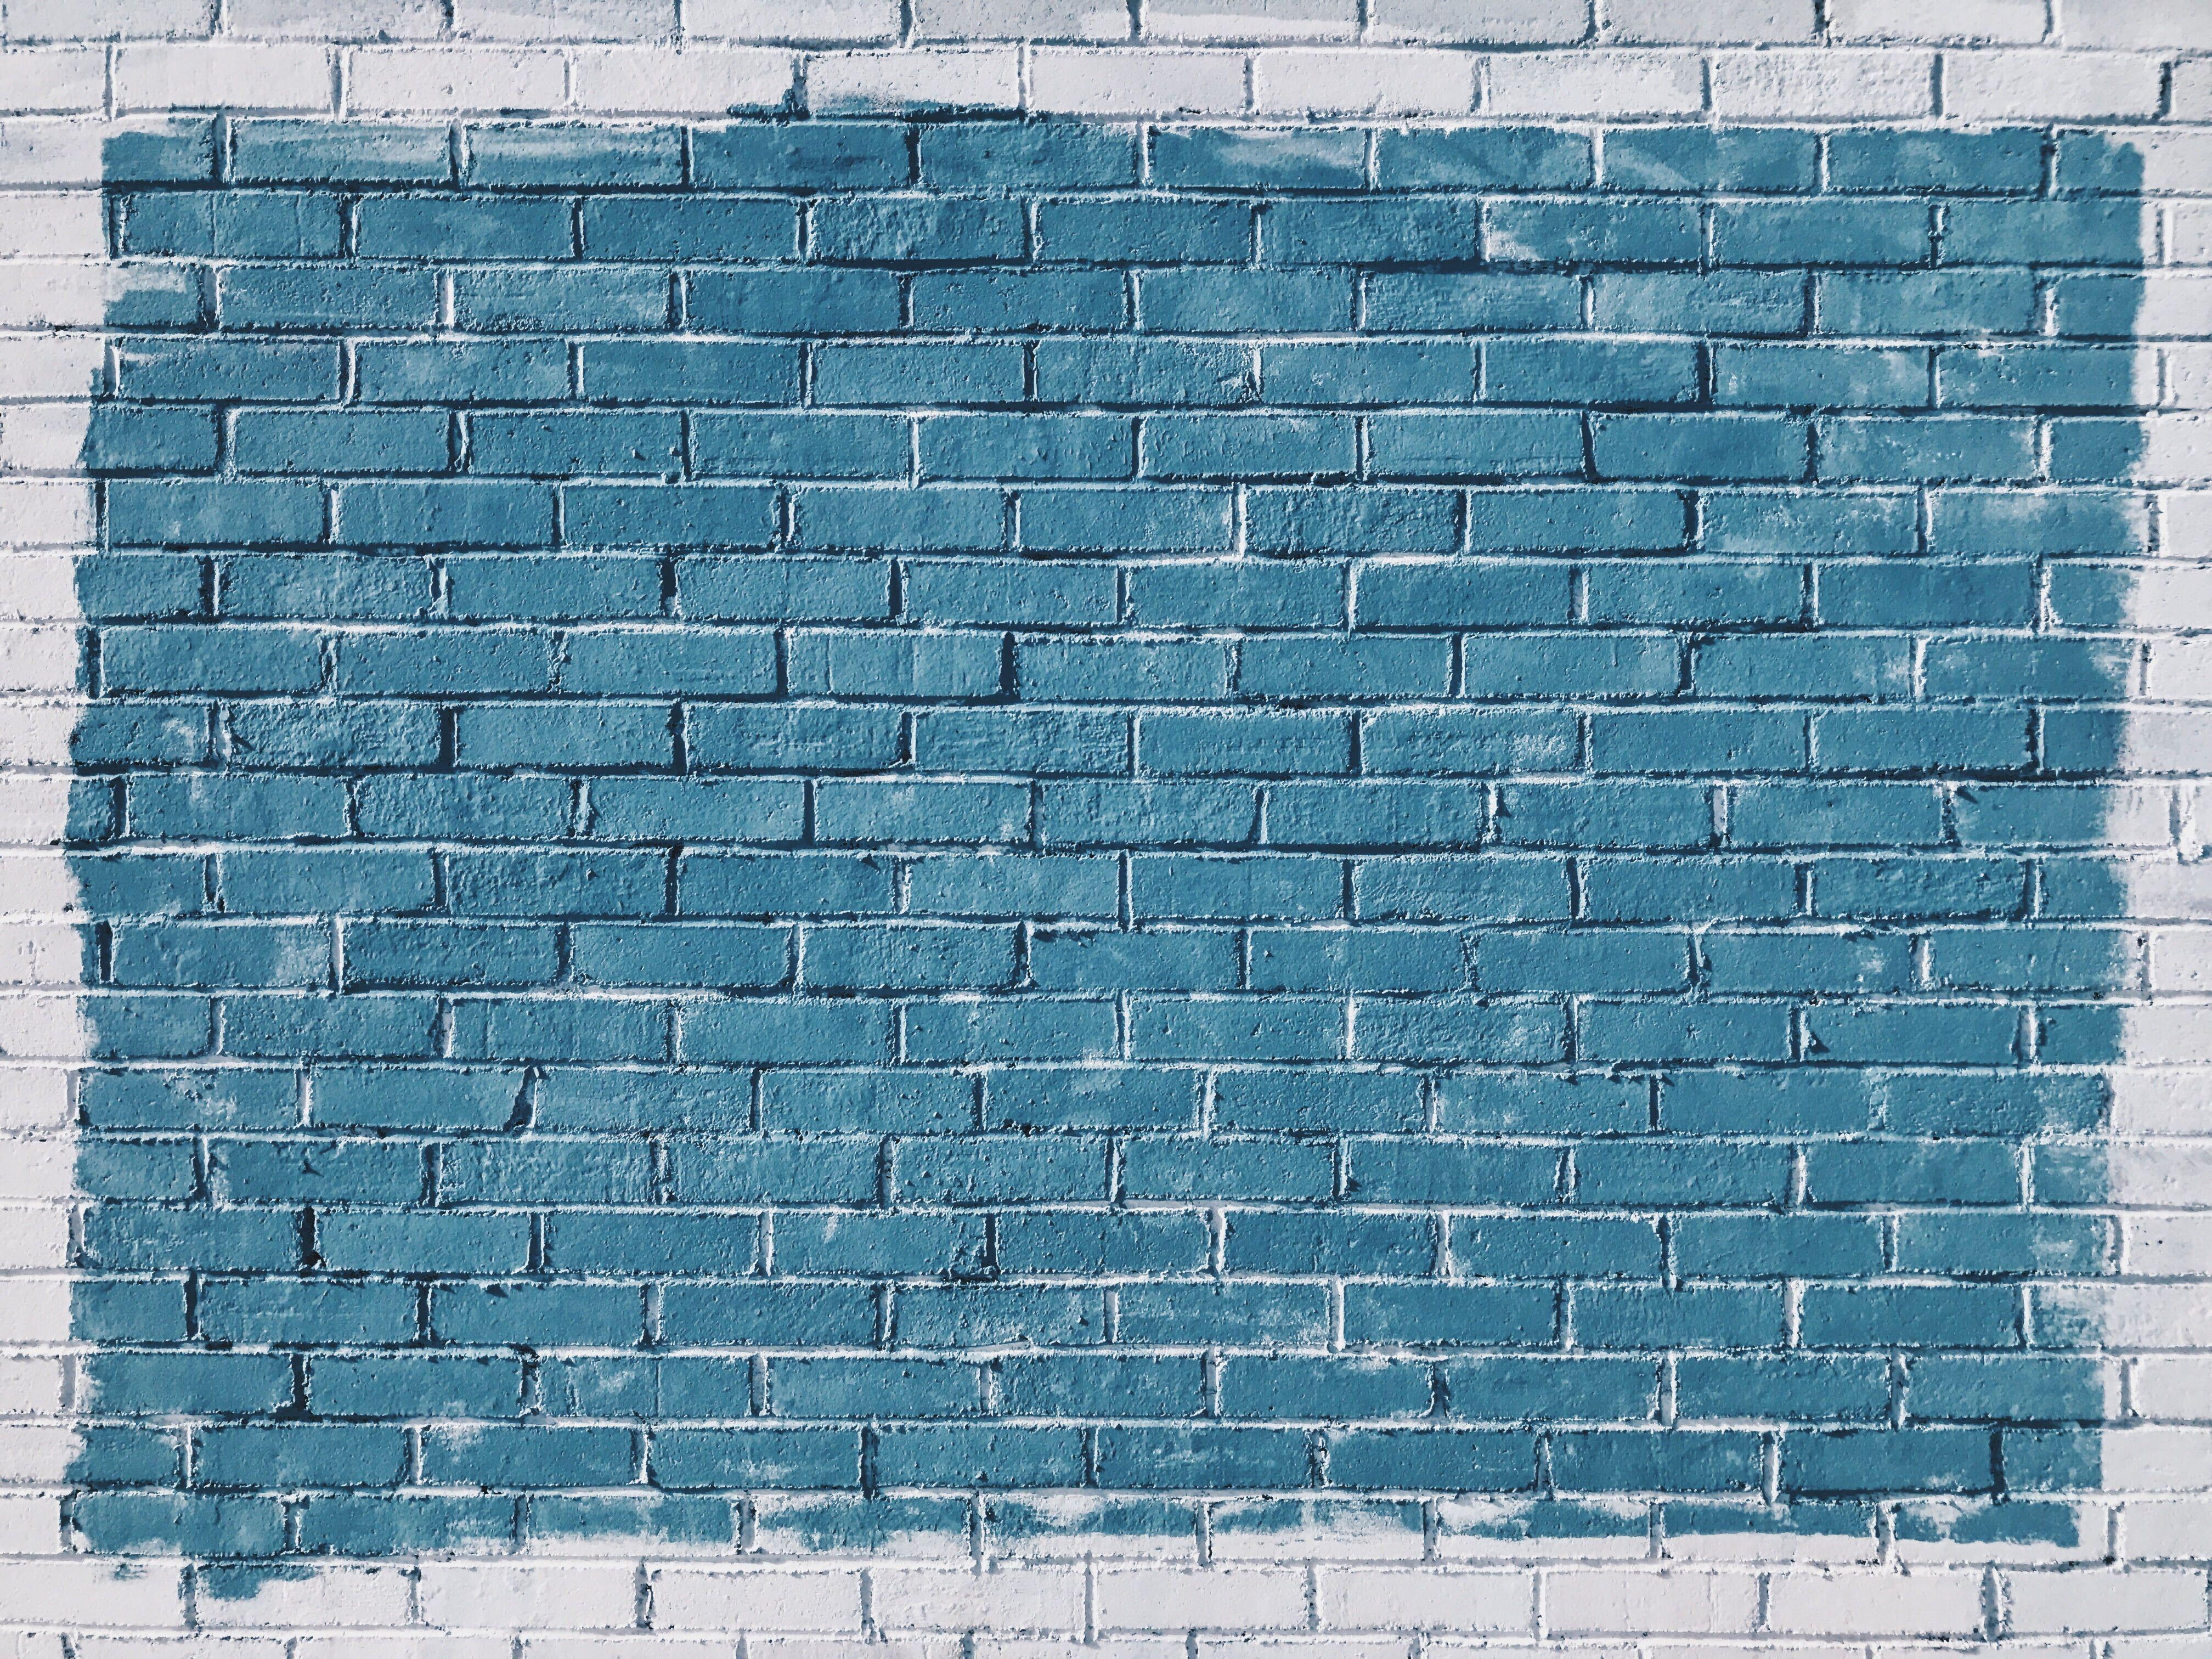 Blue And White Brick Surface Wall Bricks Paint Texture 4k Wallpaper Hdwallpaper Desktop Rick Riordan Quotes Love Book Quotes Little Women Quotes Hd wallpaper texture surface wall brick